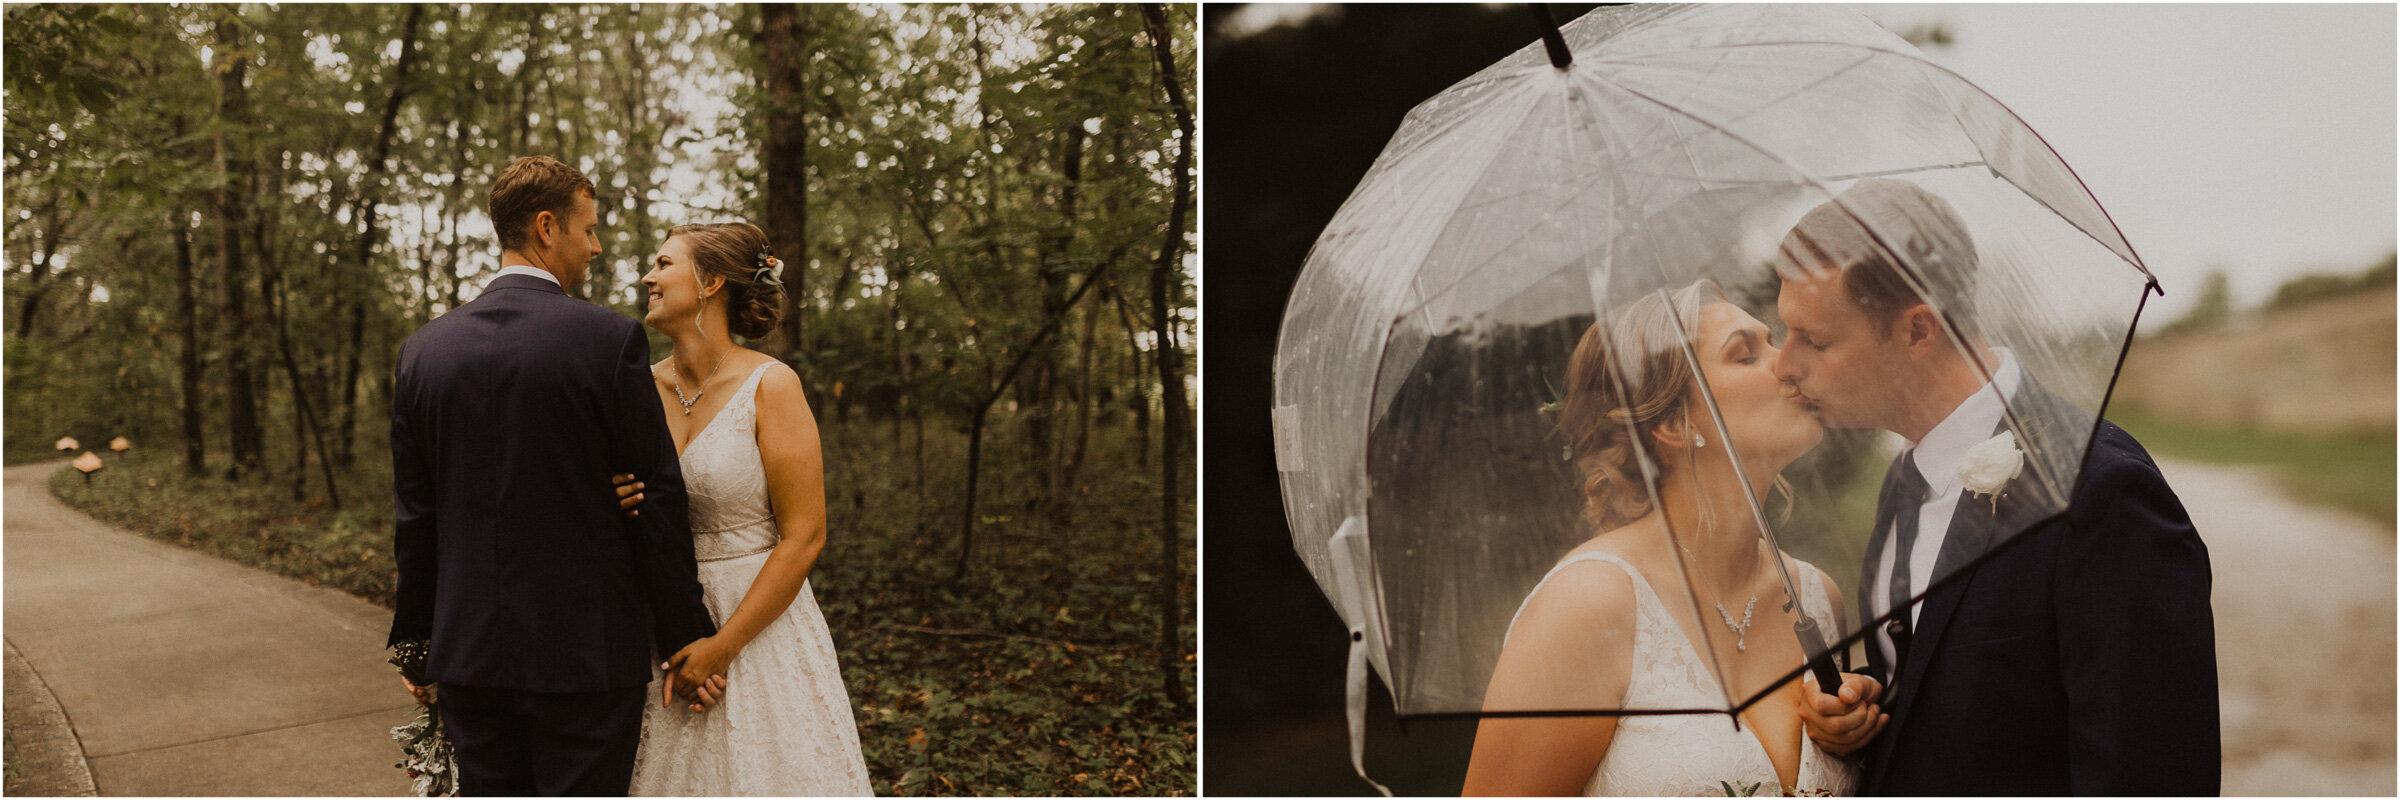 alyssa barletter photography summer wedding photographer powell gardens-26.jpg